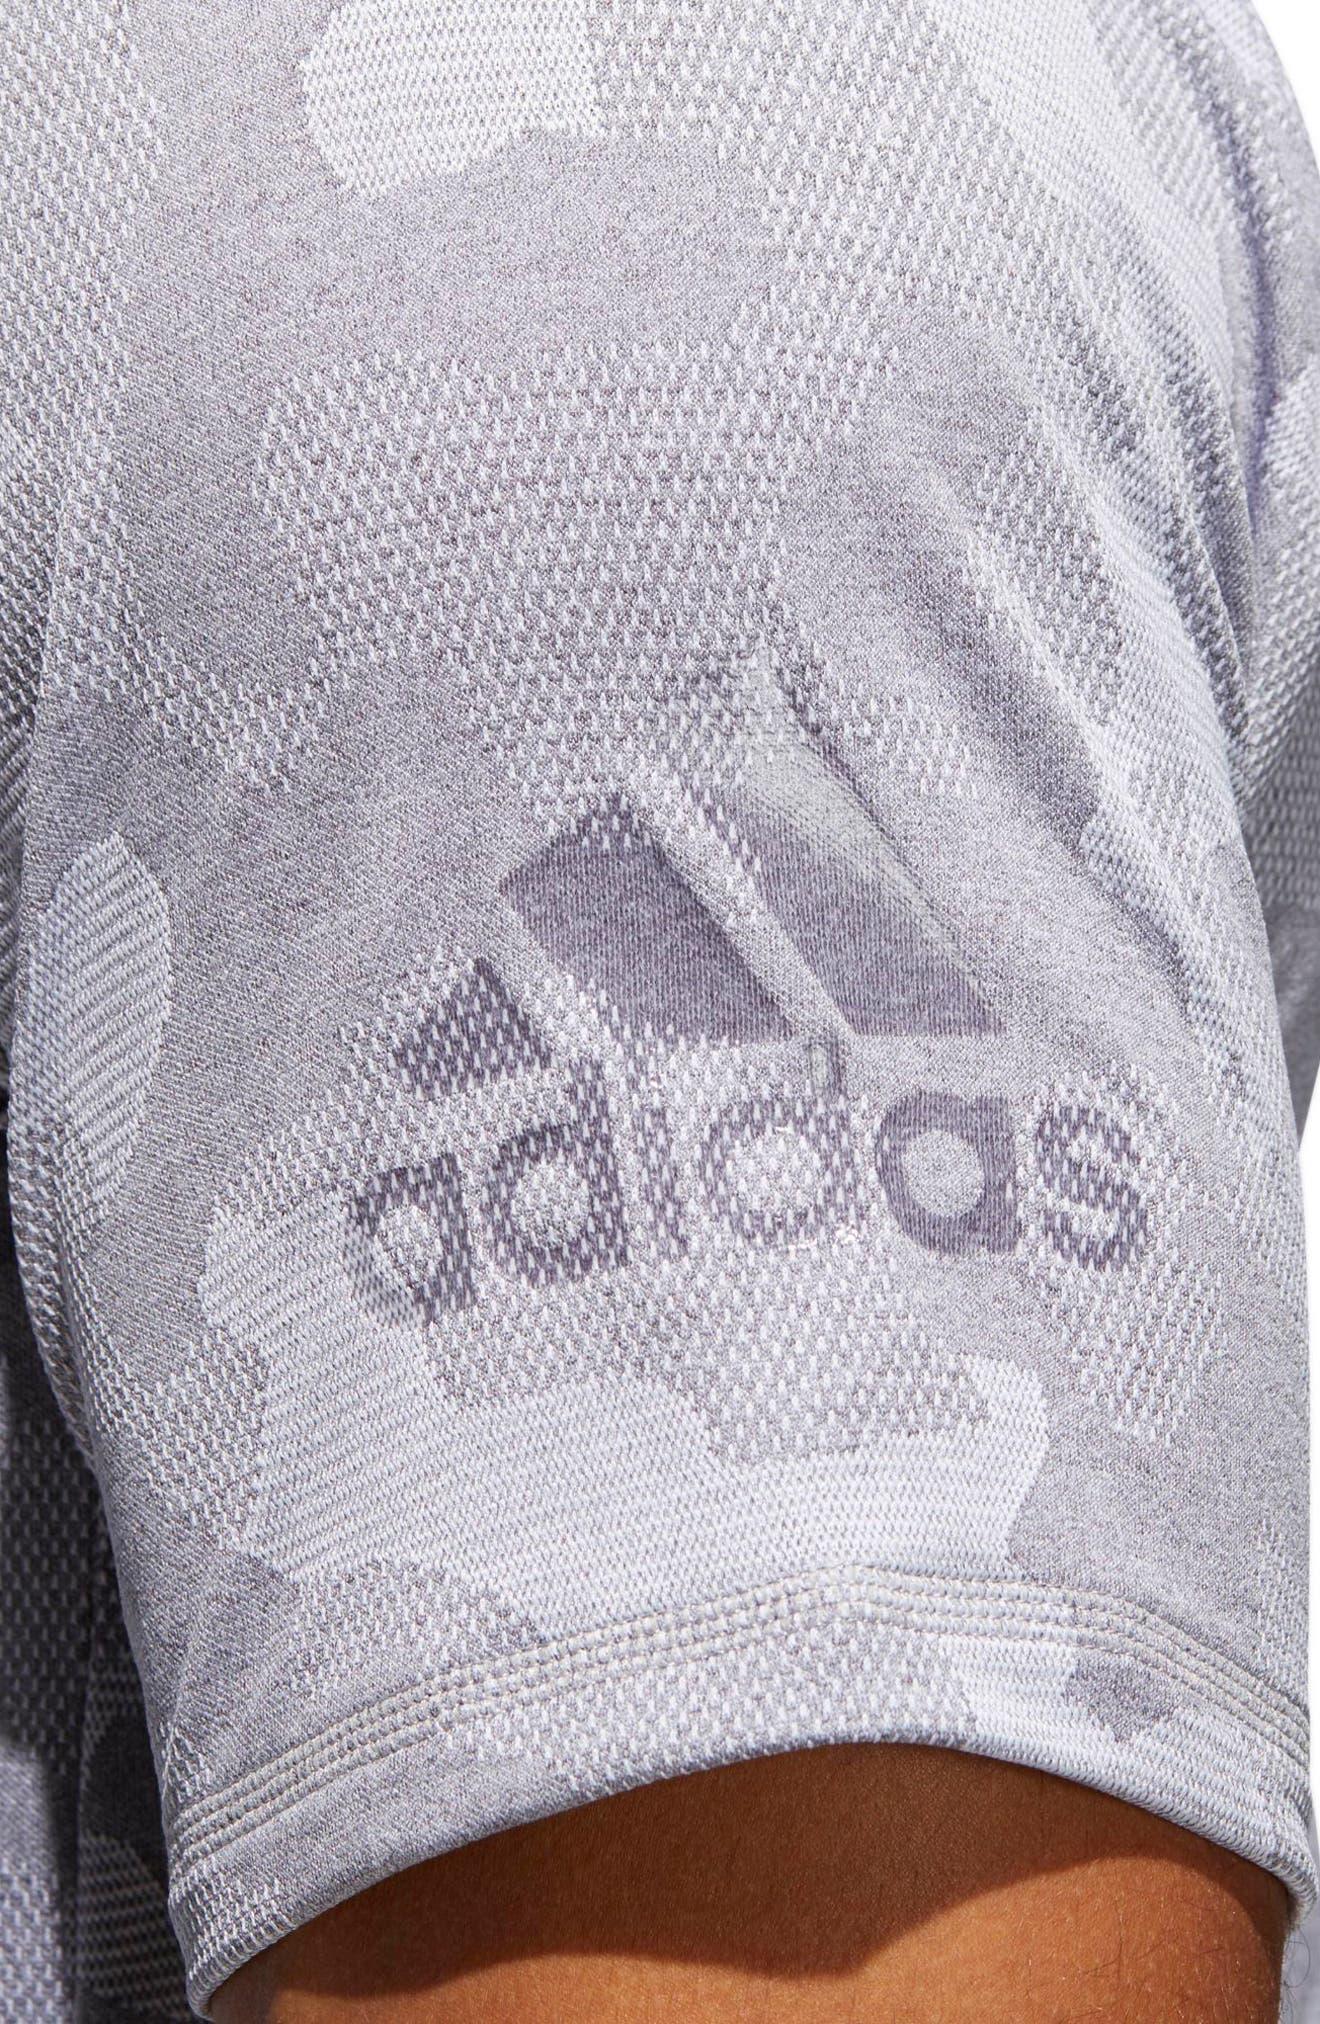 Camo Hype T-Shirt,                             Alternate thumbnail 4, color,                             Grey Three / White